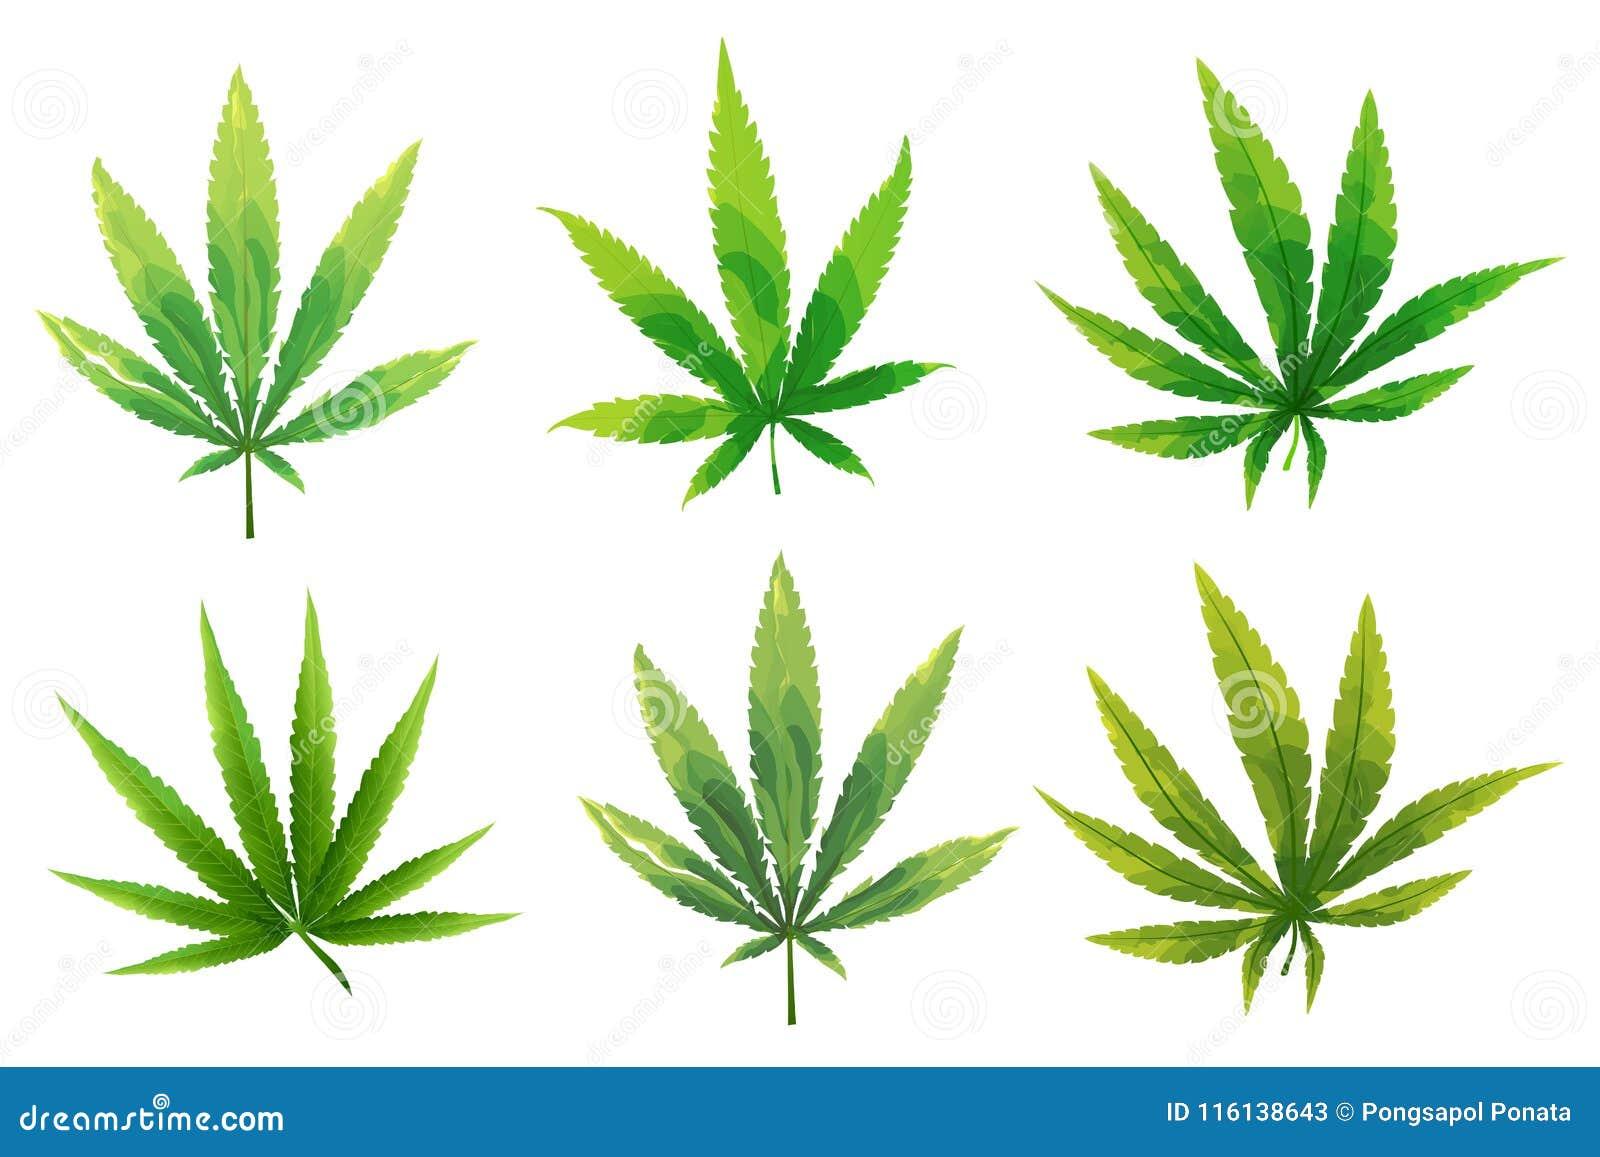 Конопля марихуана фото как найти куст марихуаны